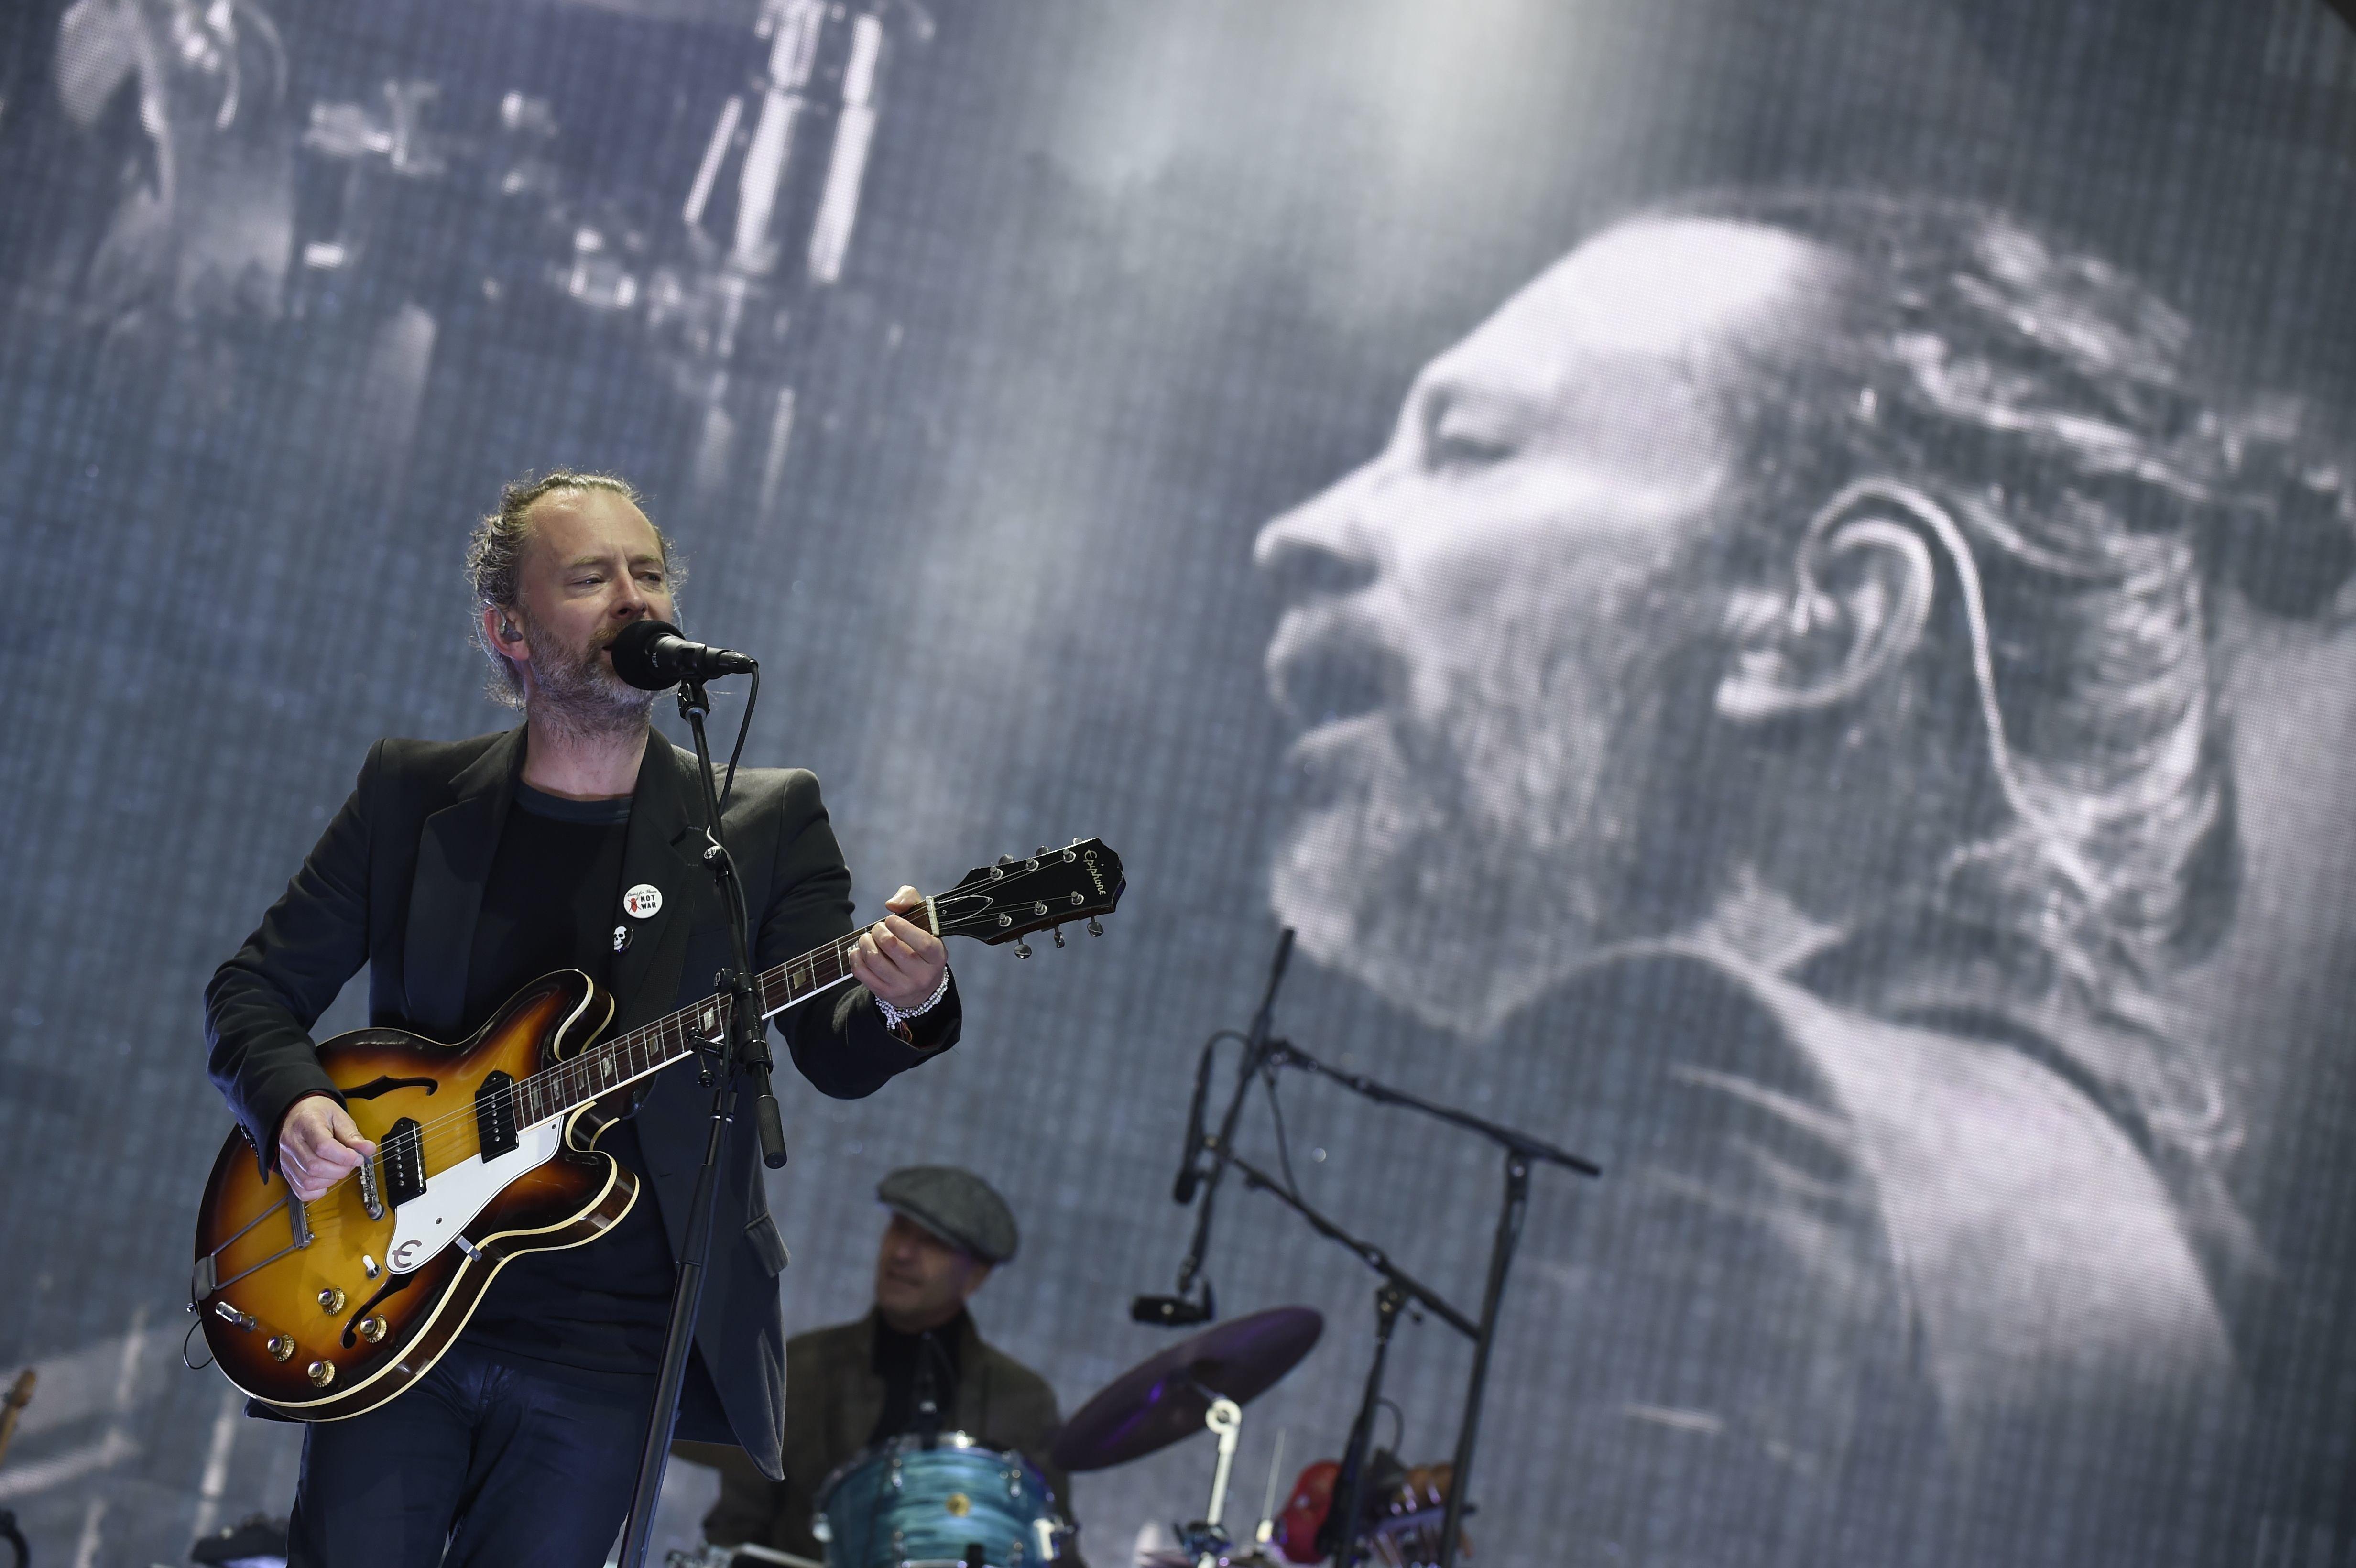 ANDY BUCHANAN via Getty Images                   Thom Yorke of Radiohead